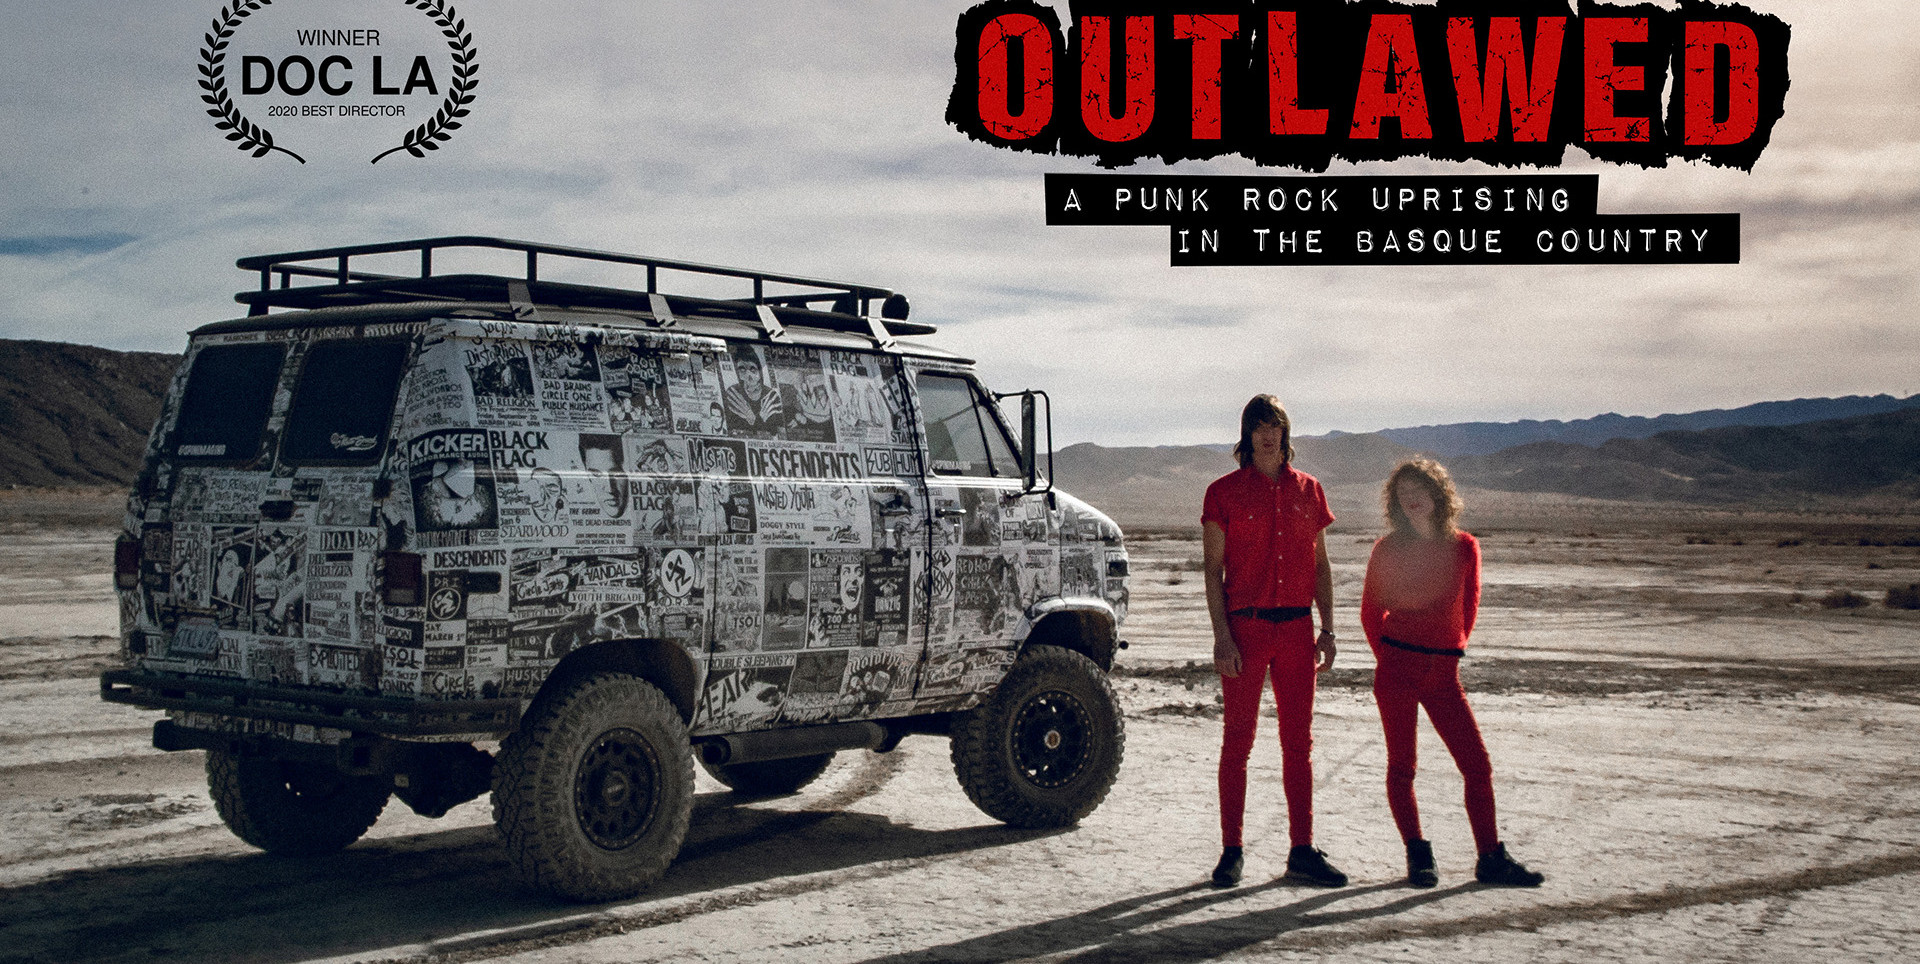 Outlawed: A Punk Rock Uprising